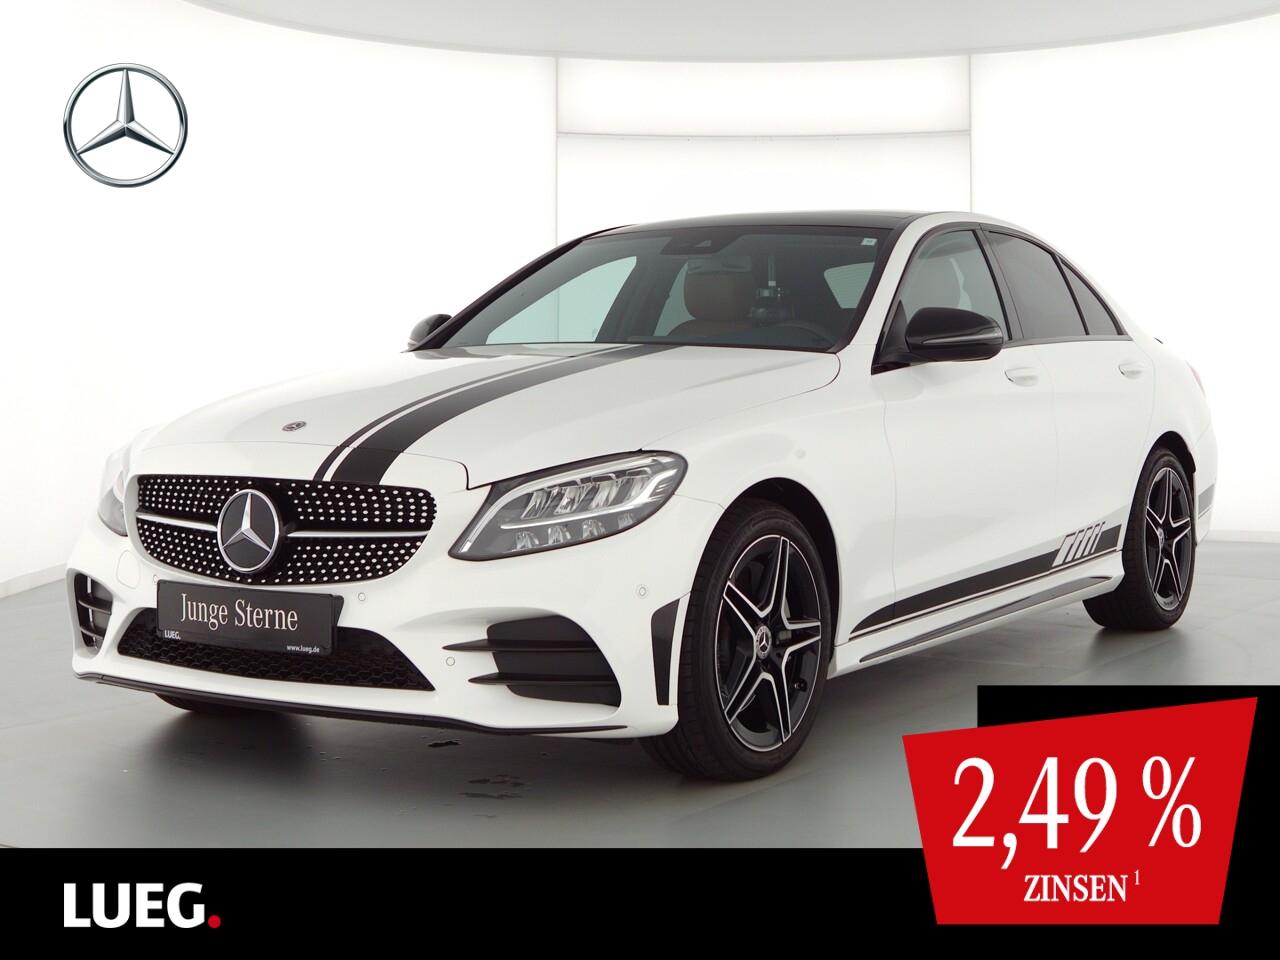 Mercedes-Benz C 300 4M AMG+Navi+Pano+LED-HP+Distr+SpurP+Kamera, Jahr 2019, Benzin